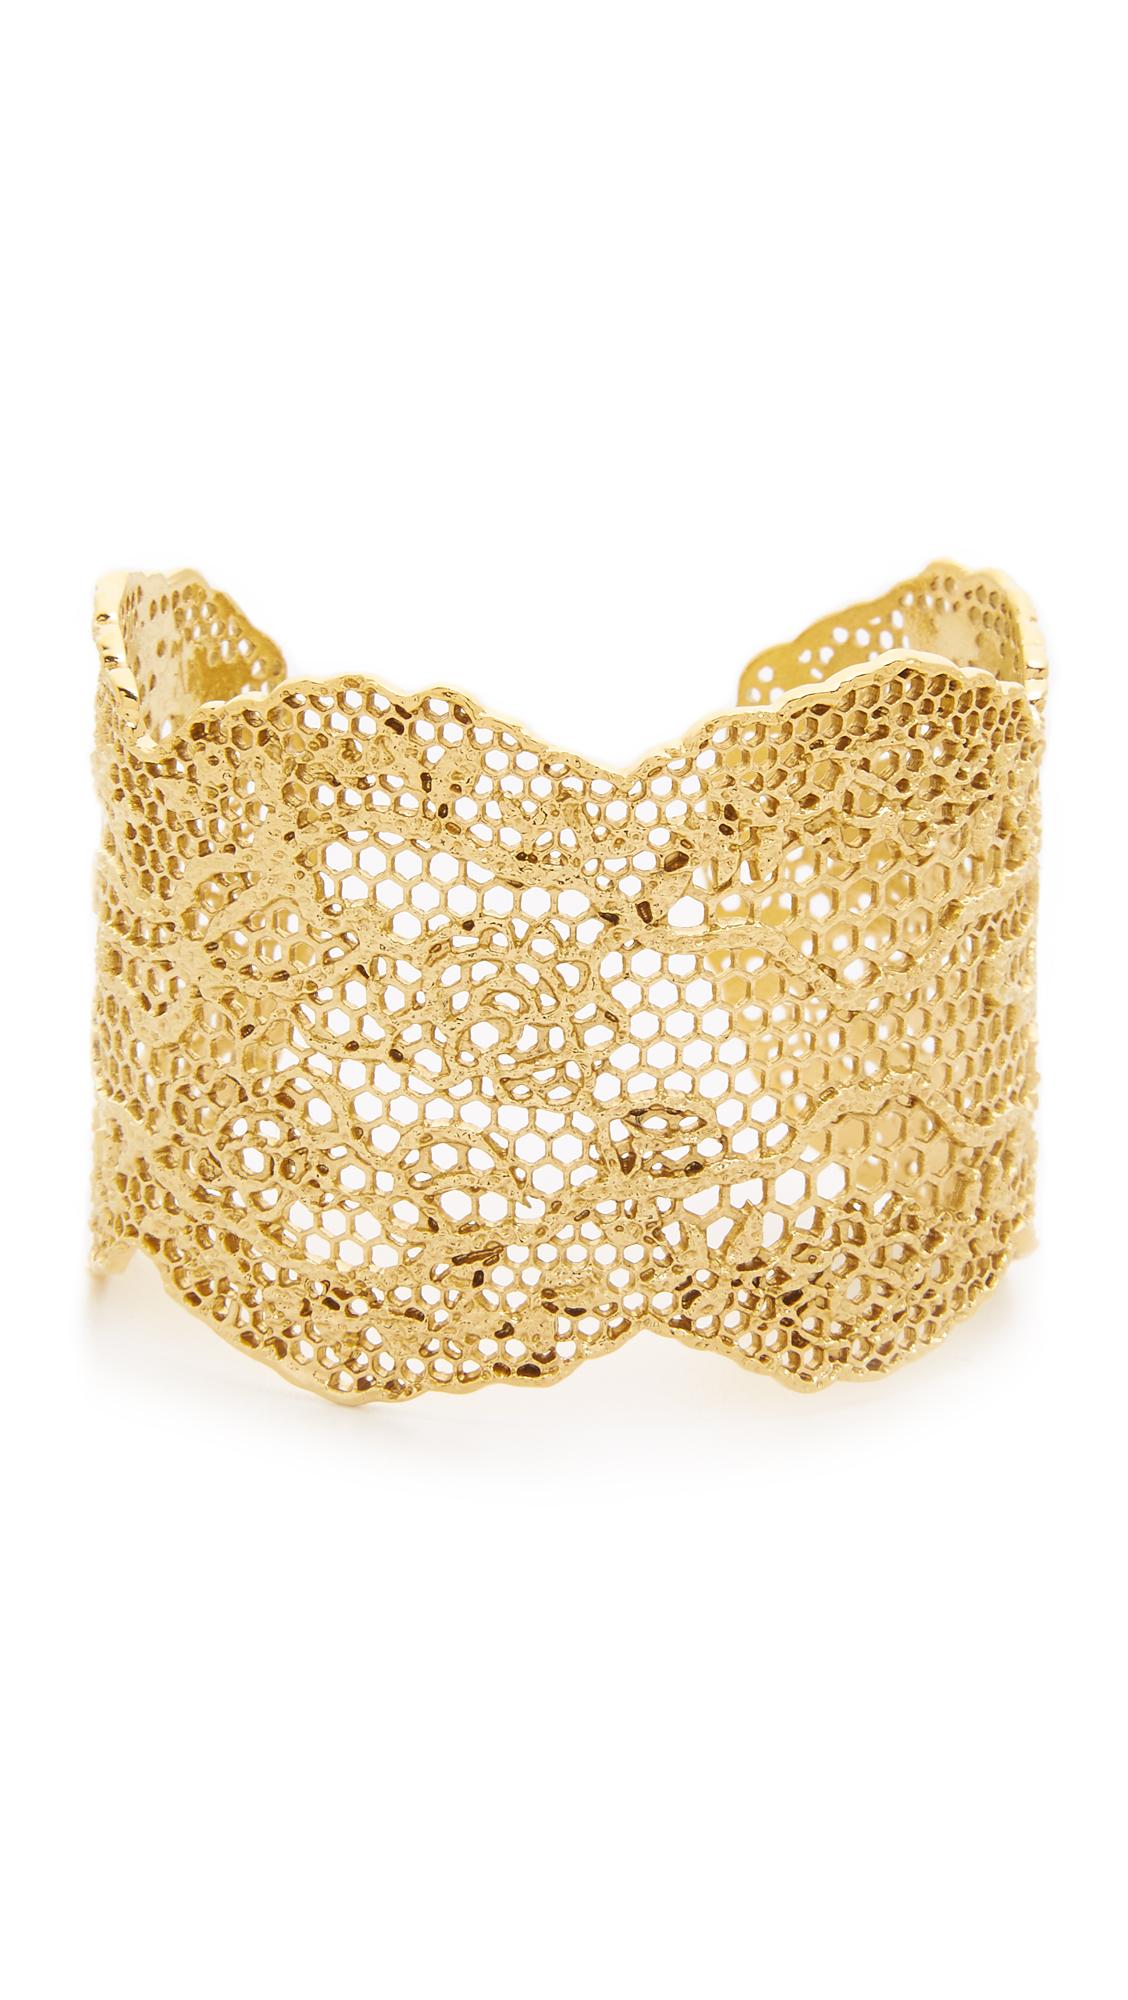 Aurelie Bidermann Laser Cut Vintage Lace Cuff - Gold at Shopbop